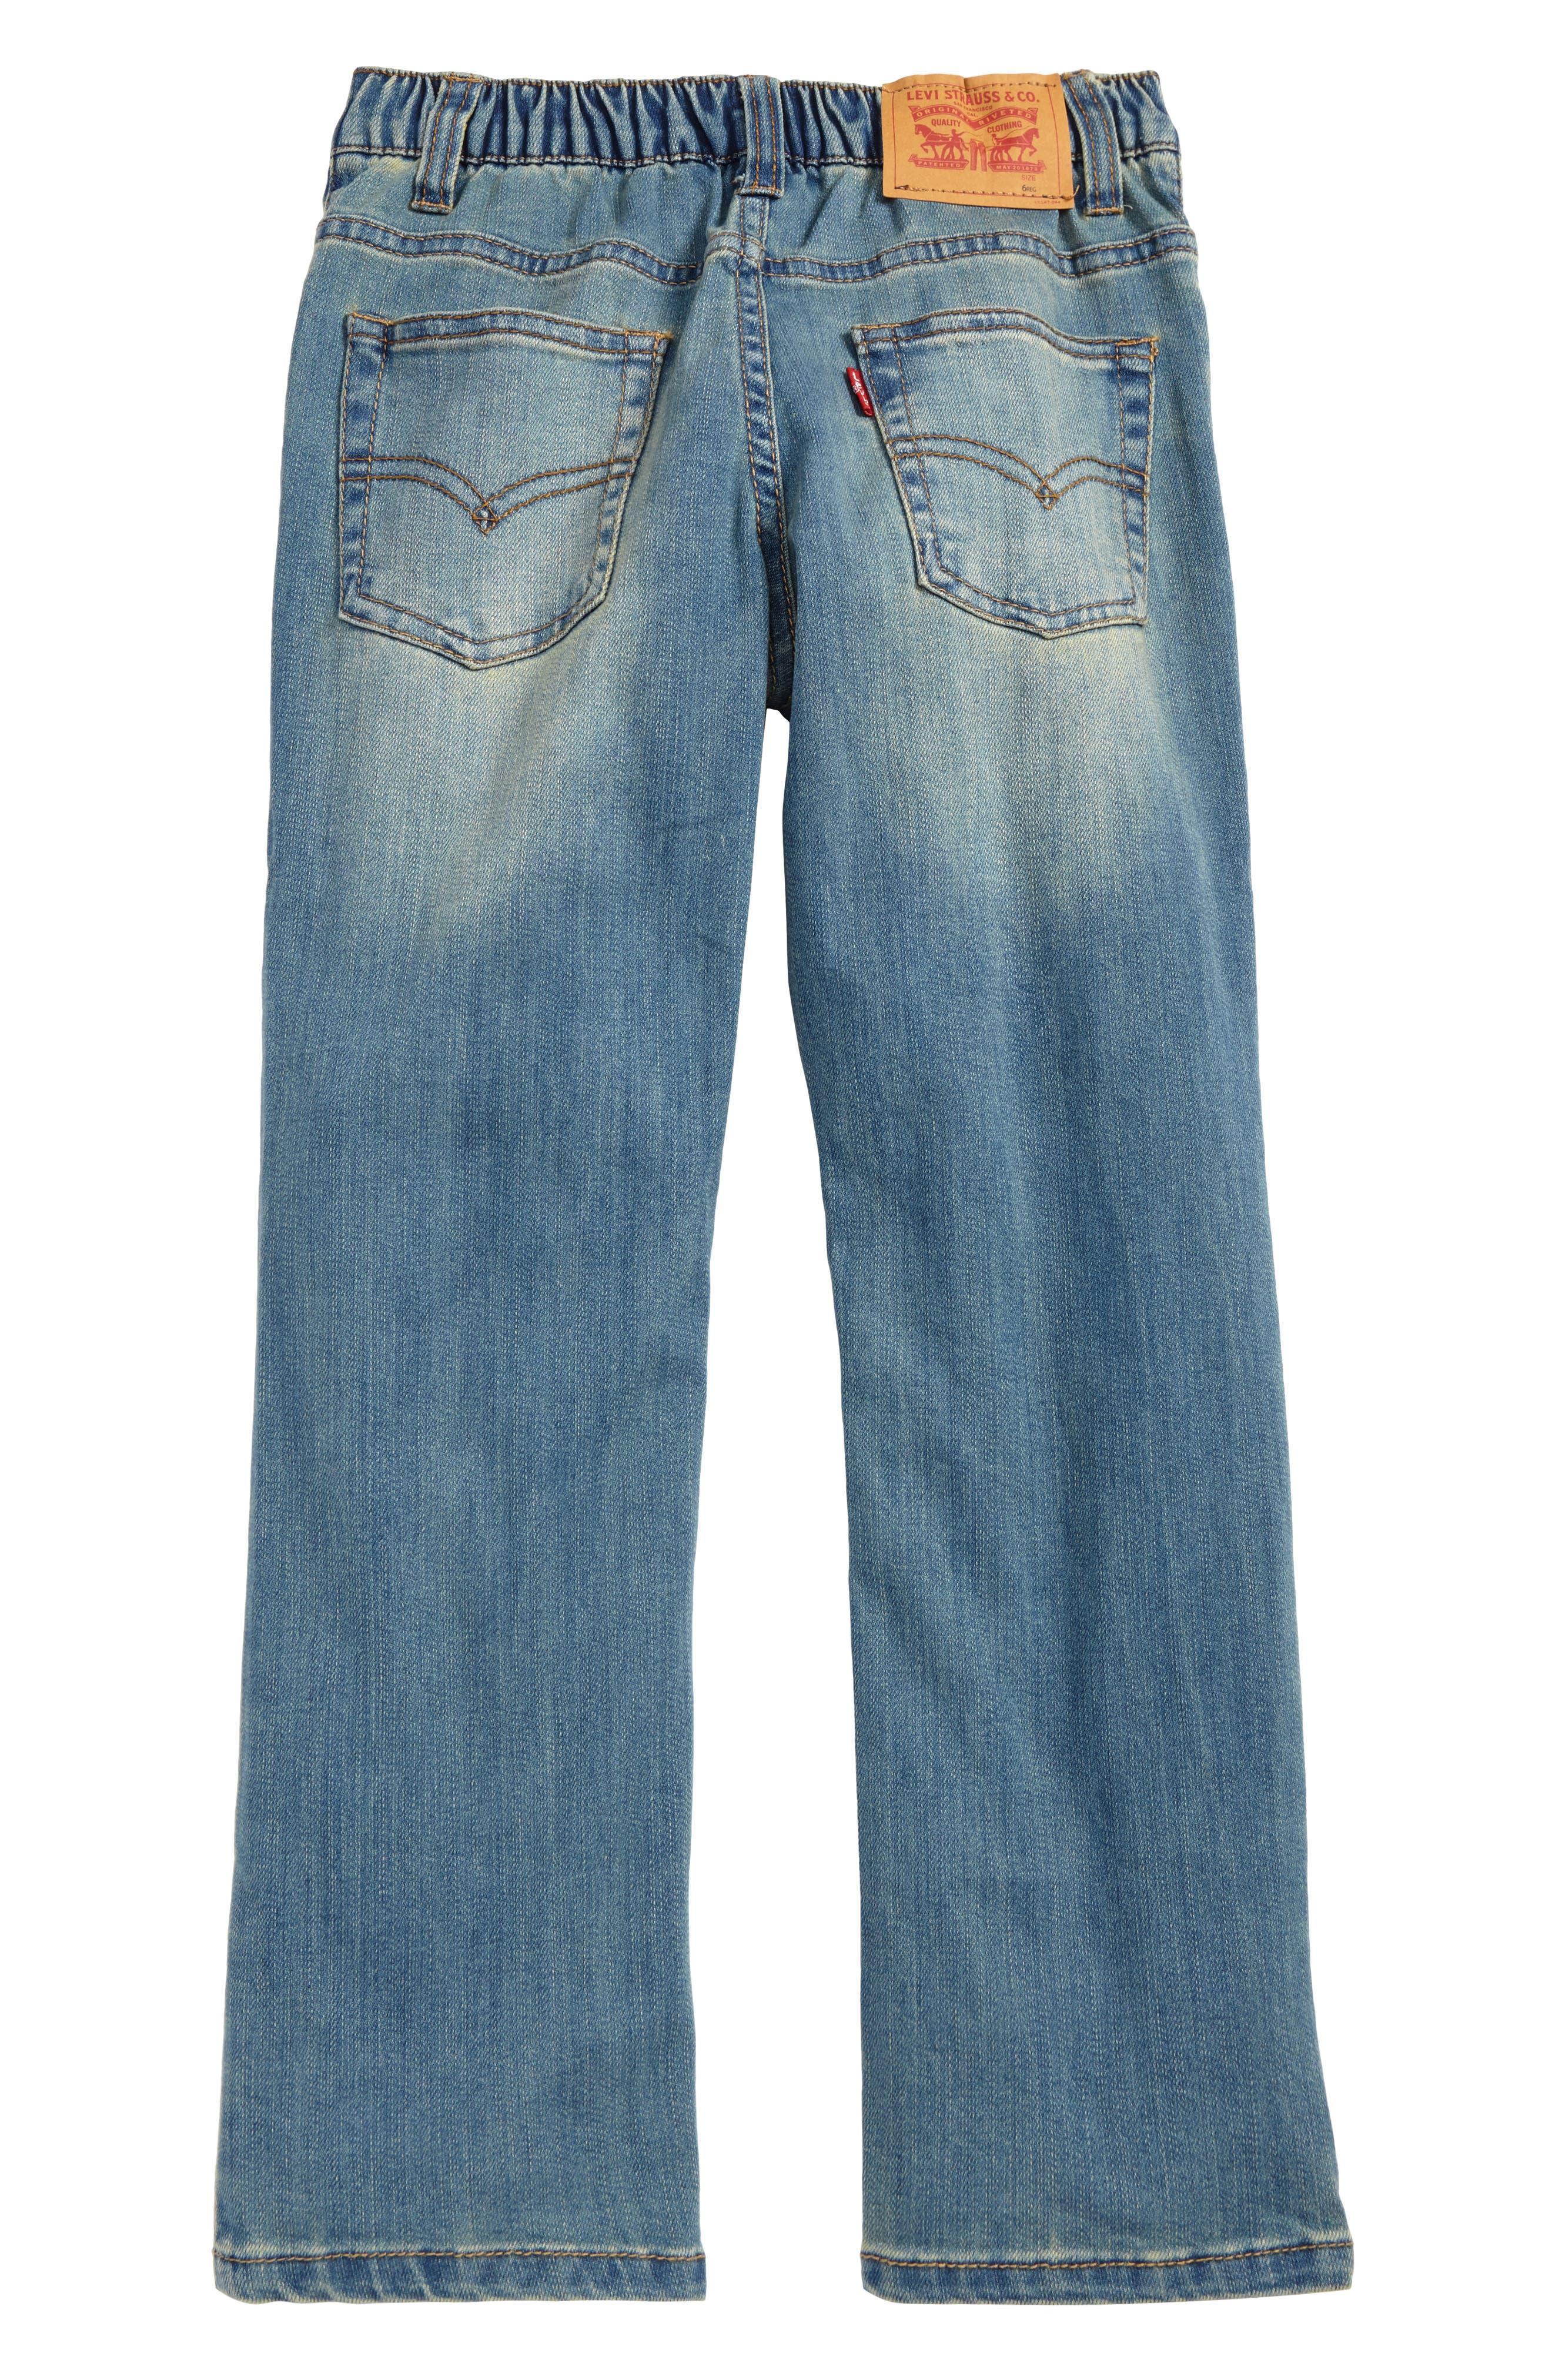 Comfort Slim Fit Jeans,                             Alternate thumbnail 2, color,